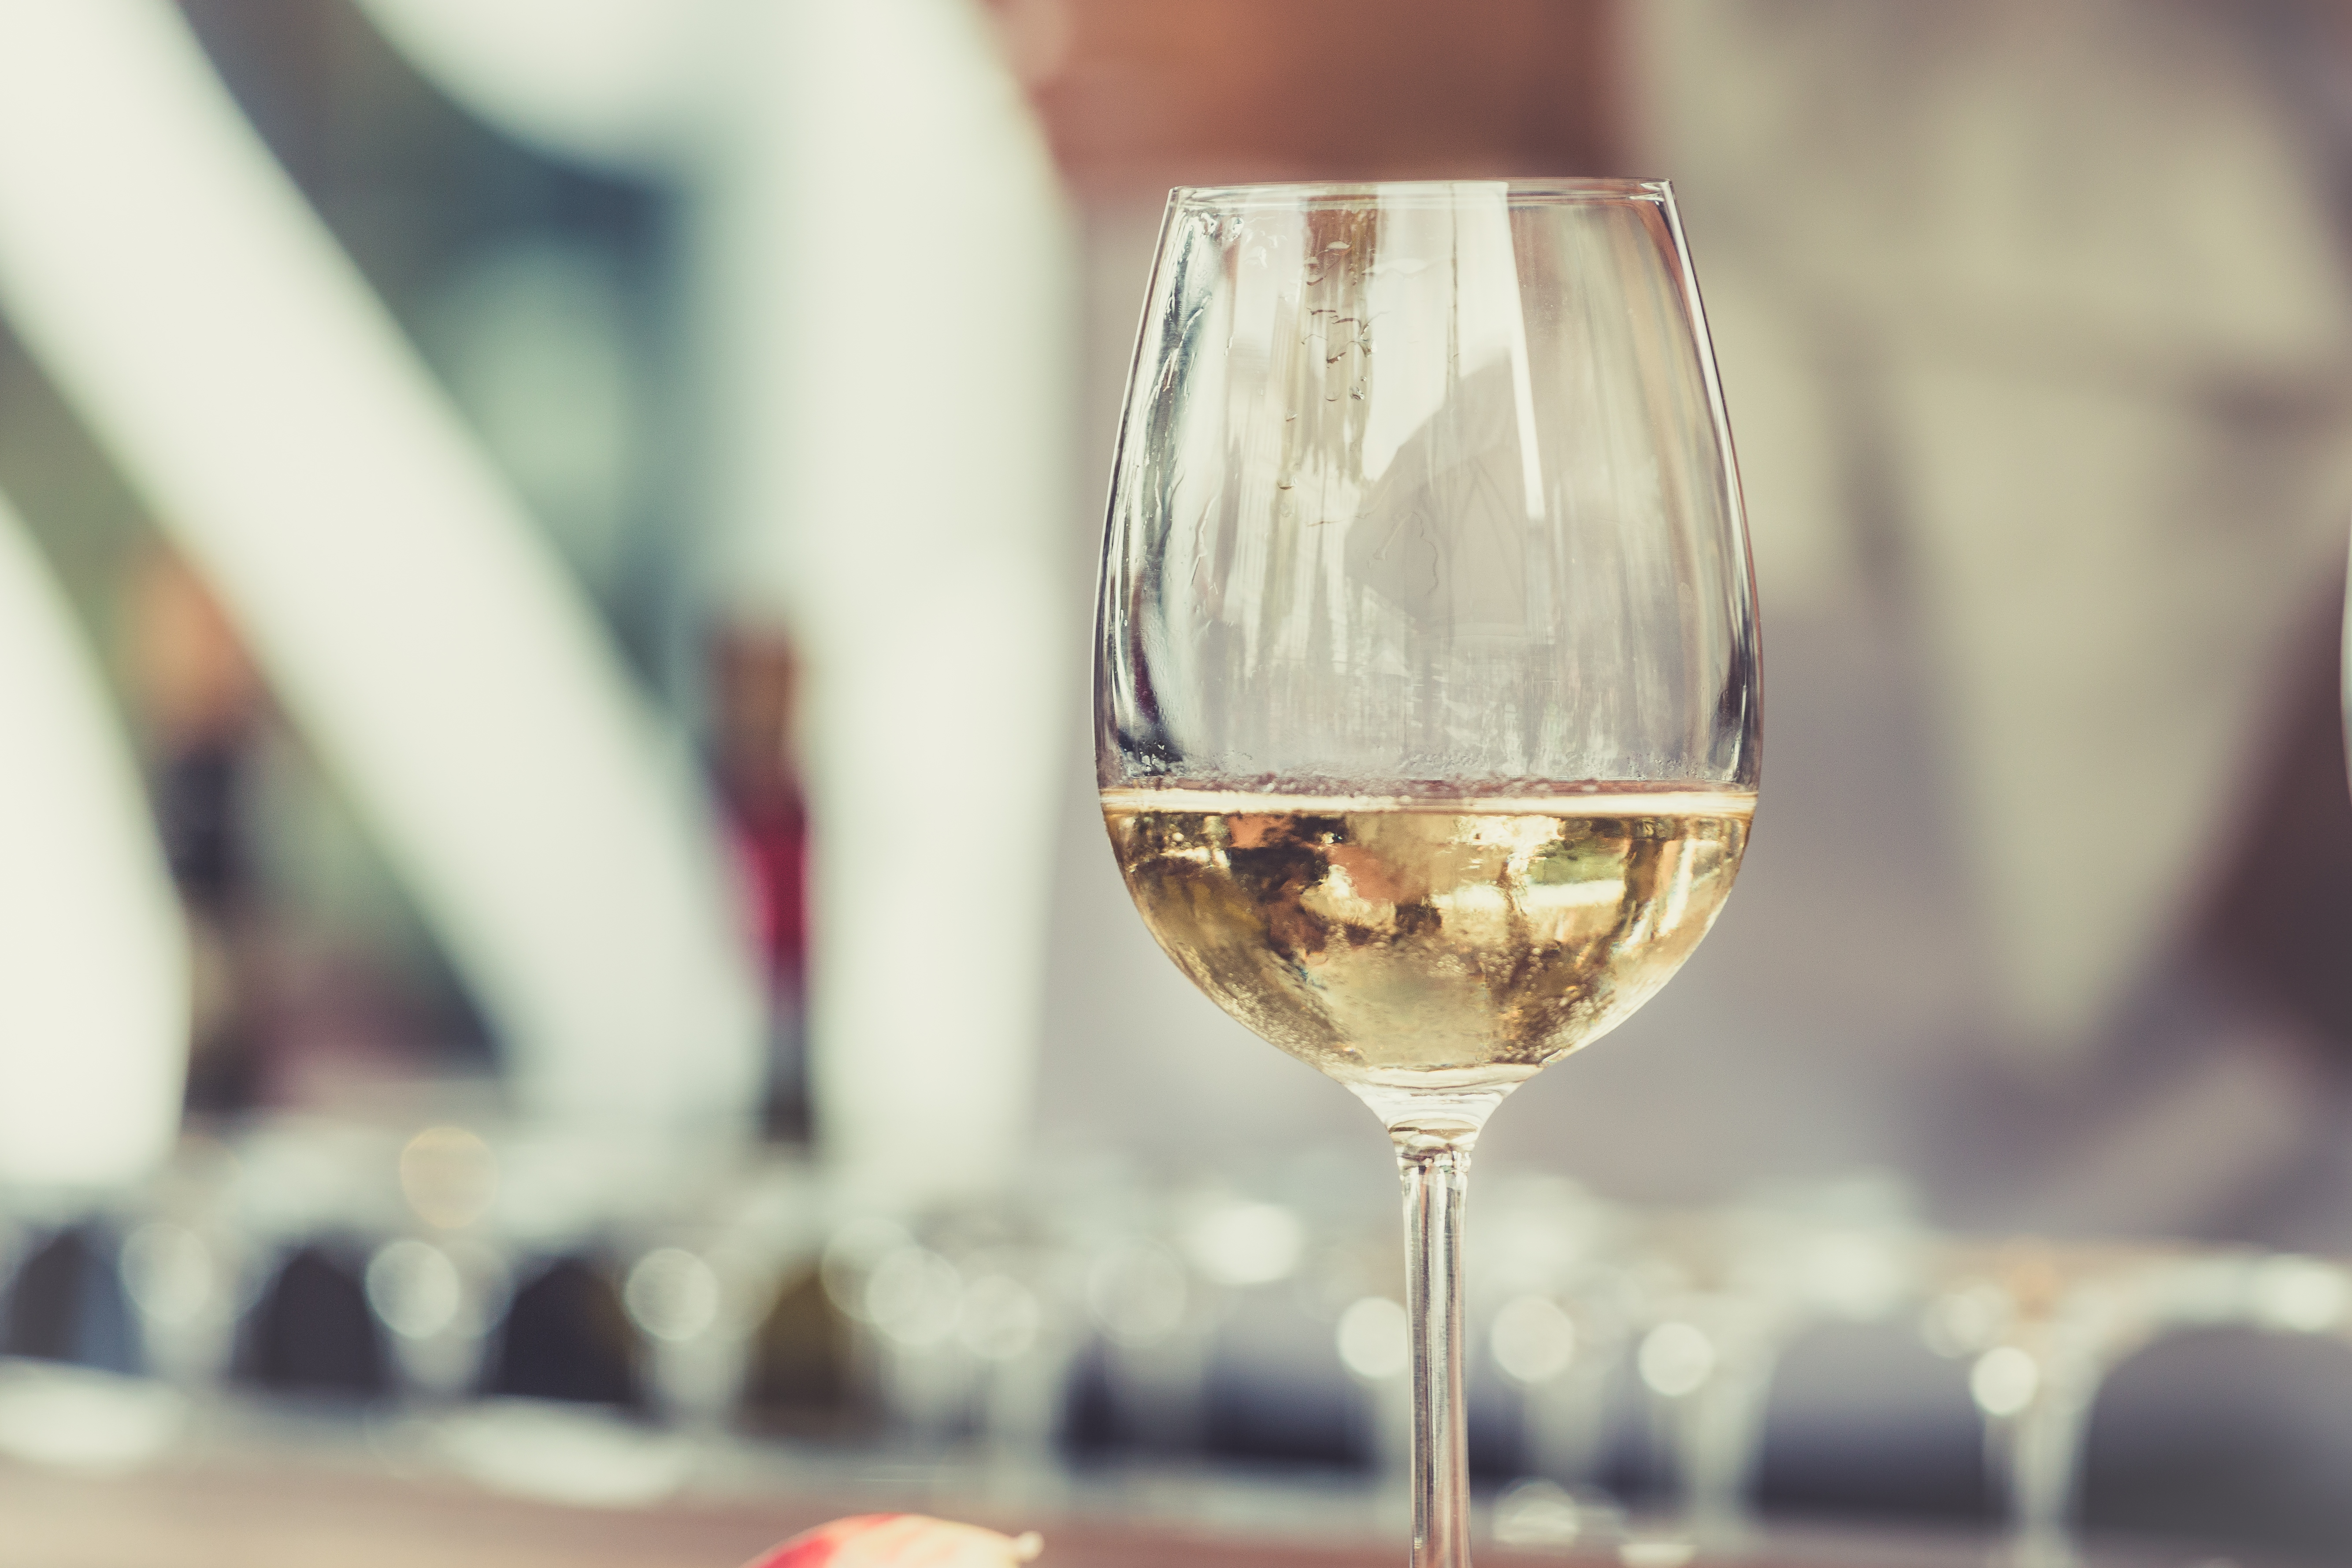 negative-space-glass-white-wine-thomas-martinsen